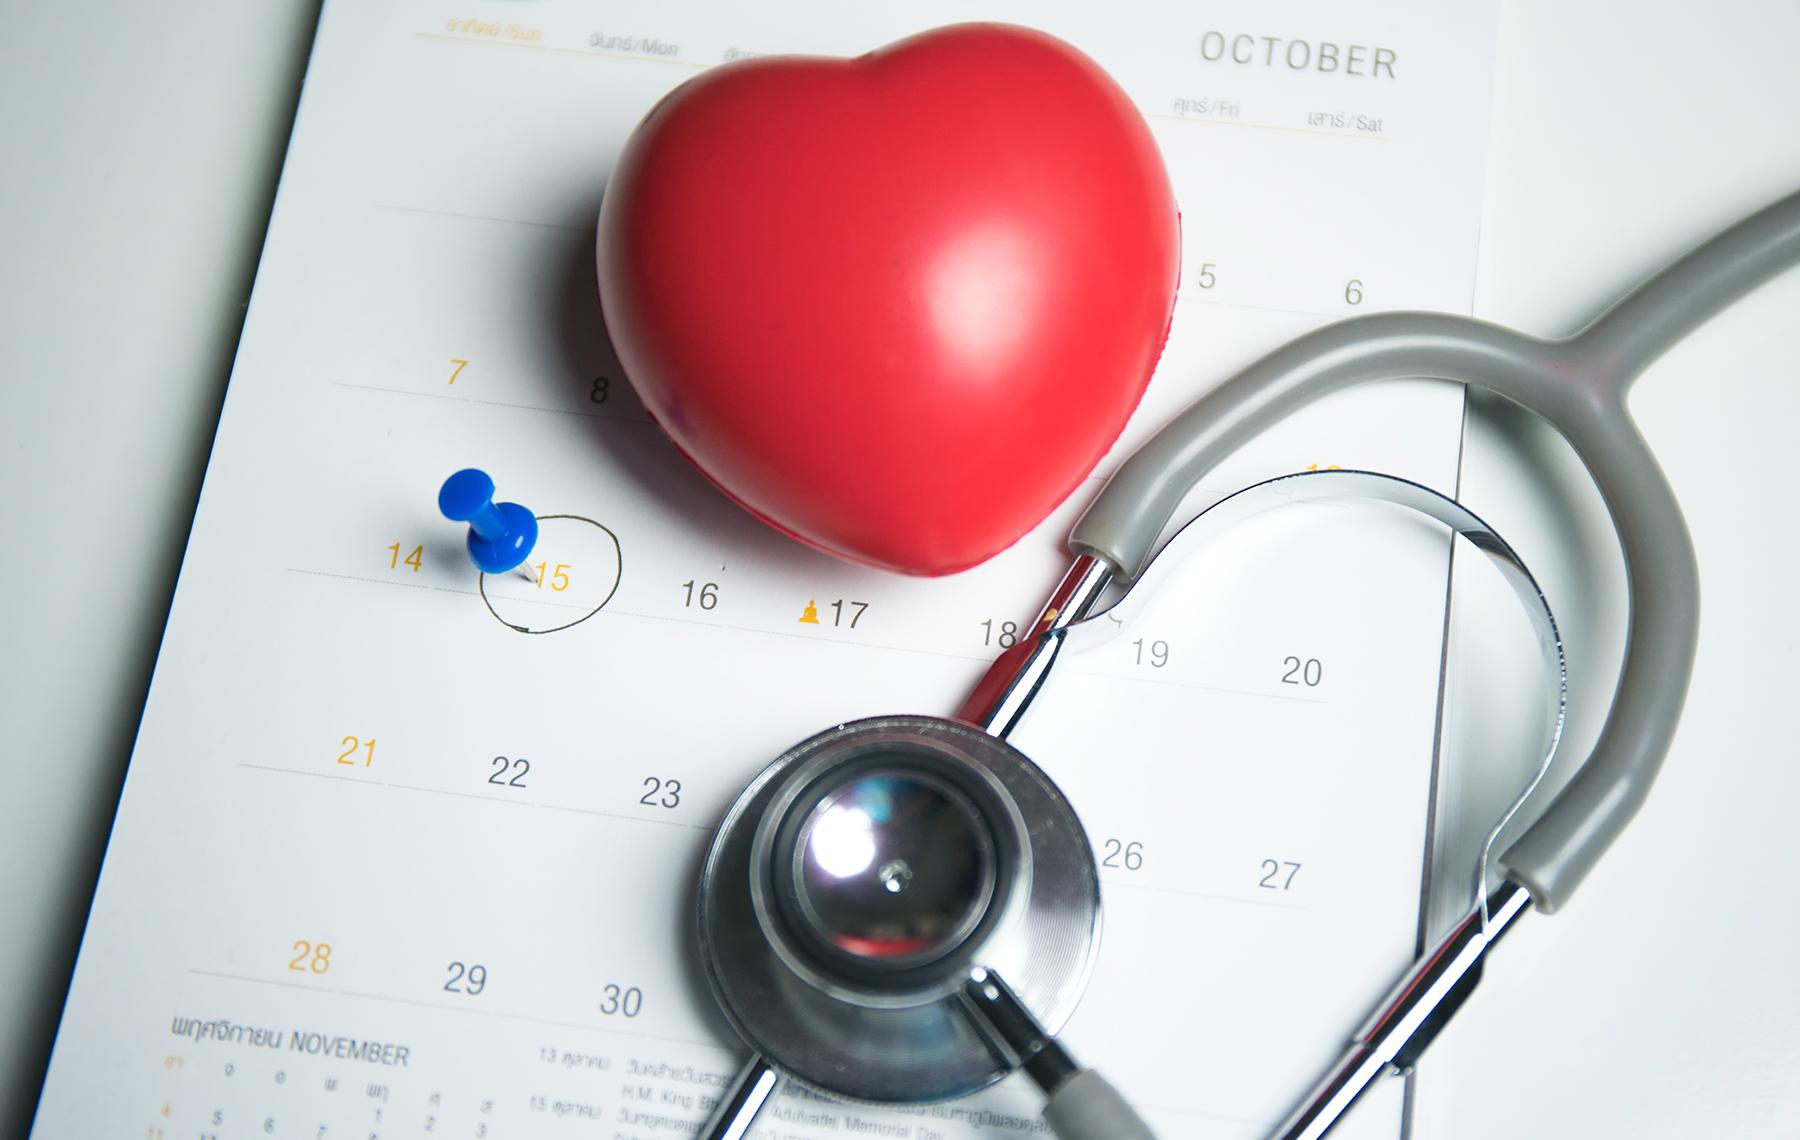 Calendar and a heart